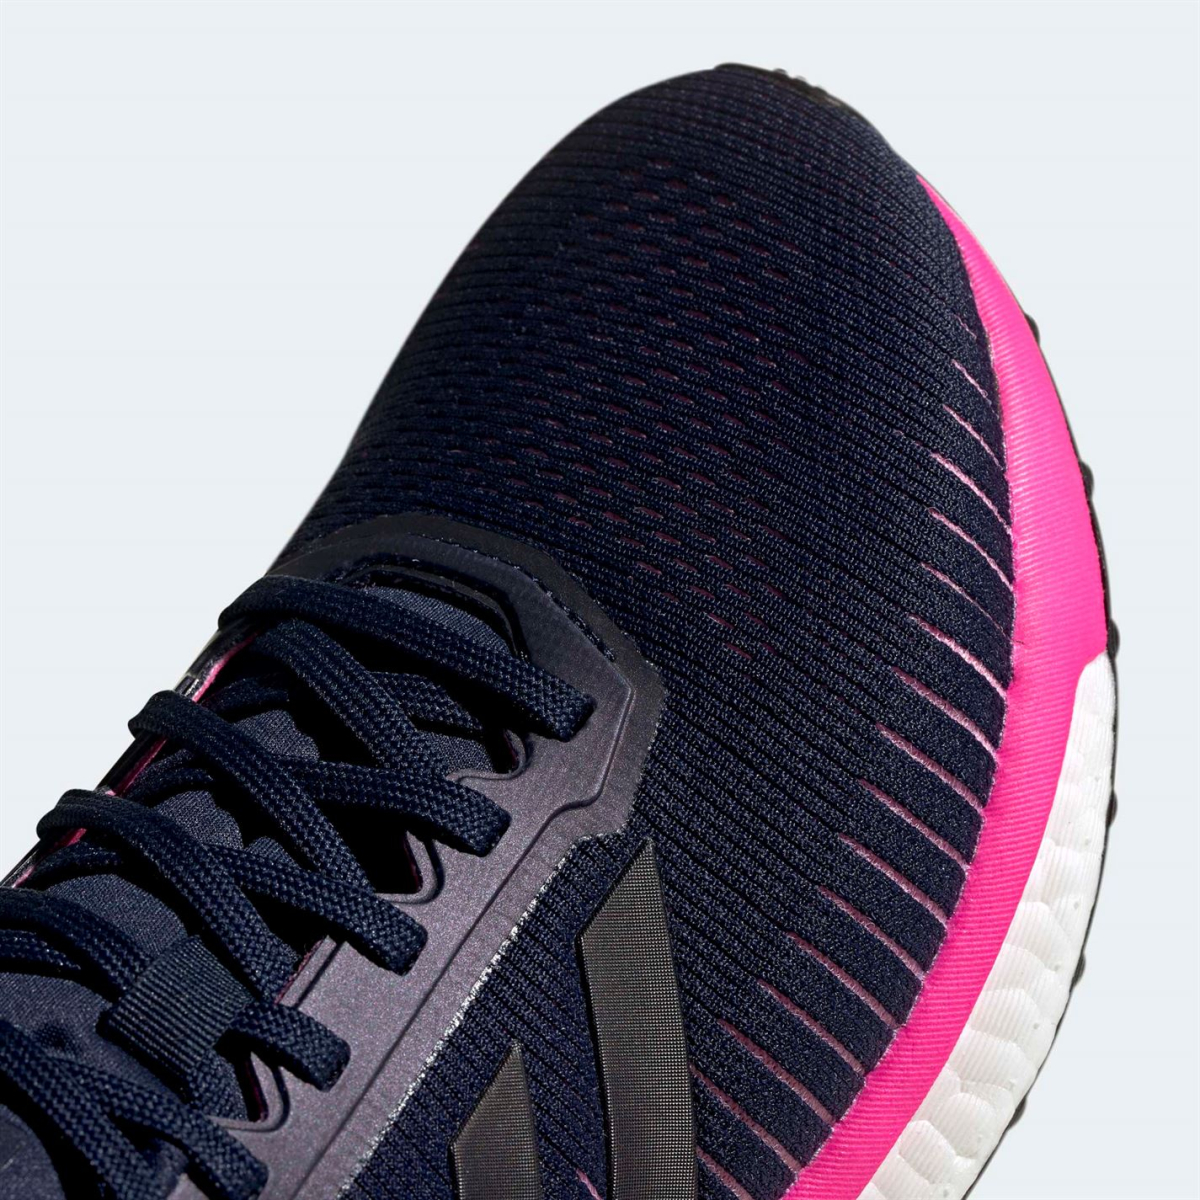 adidas-Solar-Drive-Laufschuhe-Damen-Sportschuhe-Turnschuhe-Jogging-4095 Indexbild 11